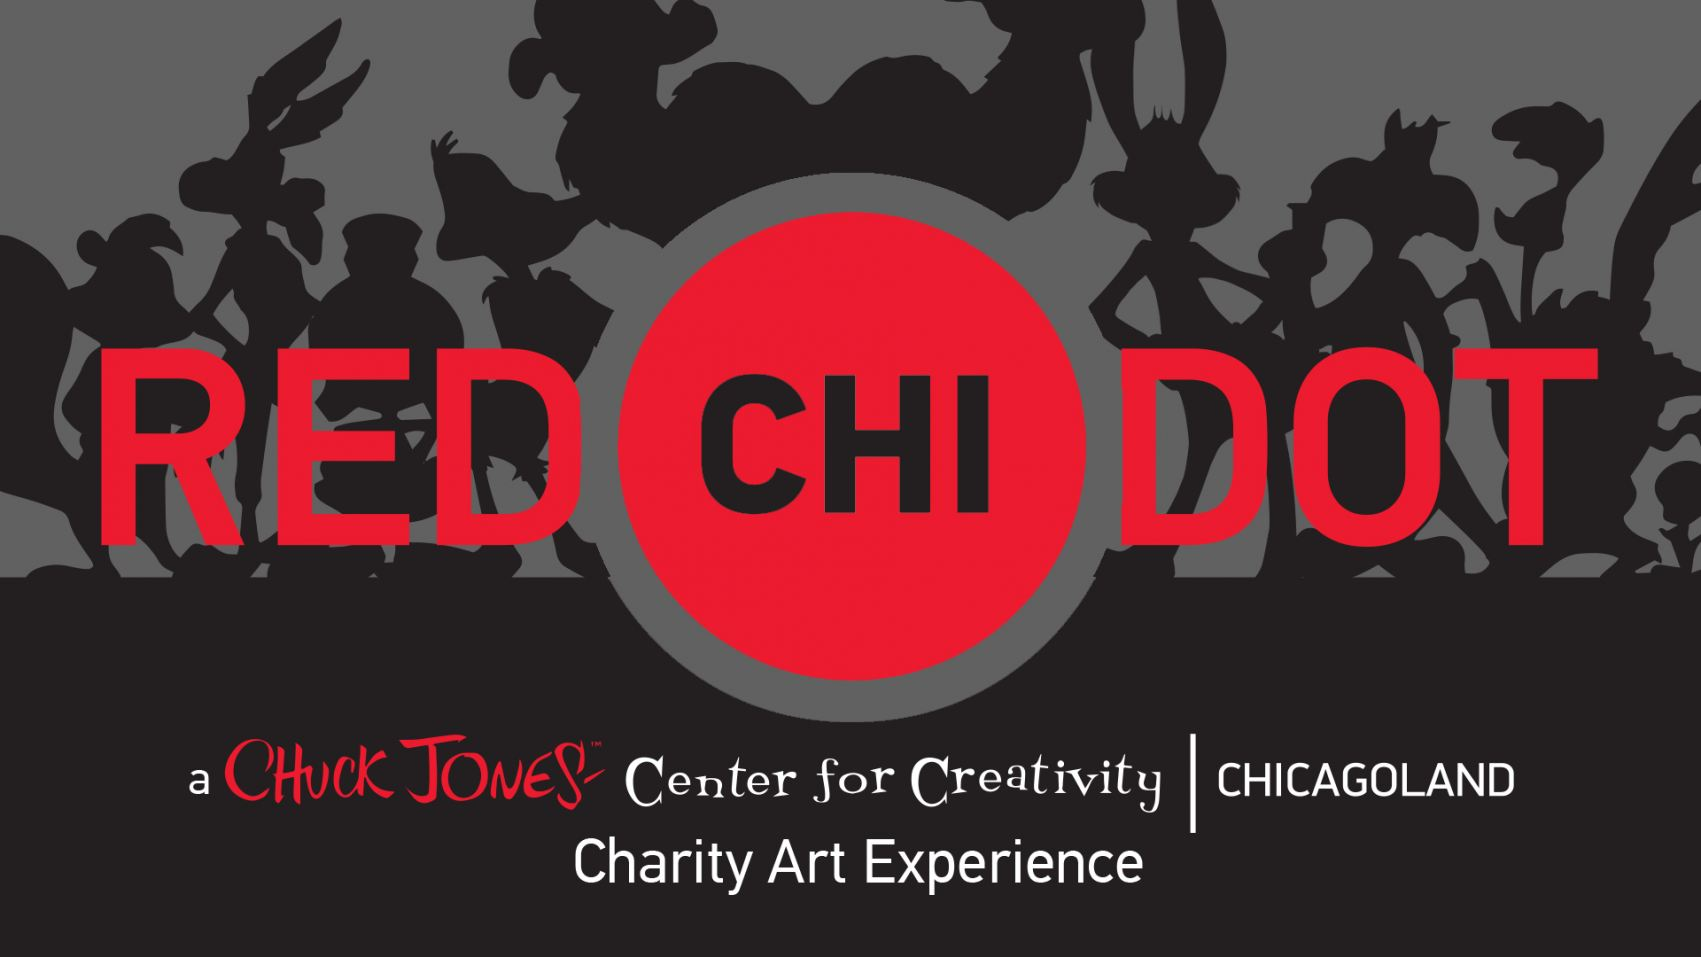 Red Dot Chicago